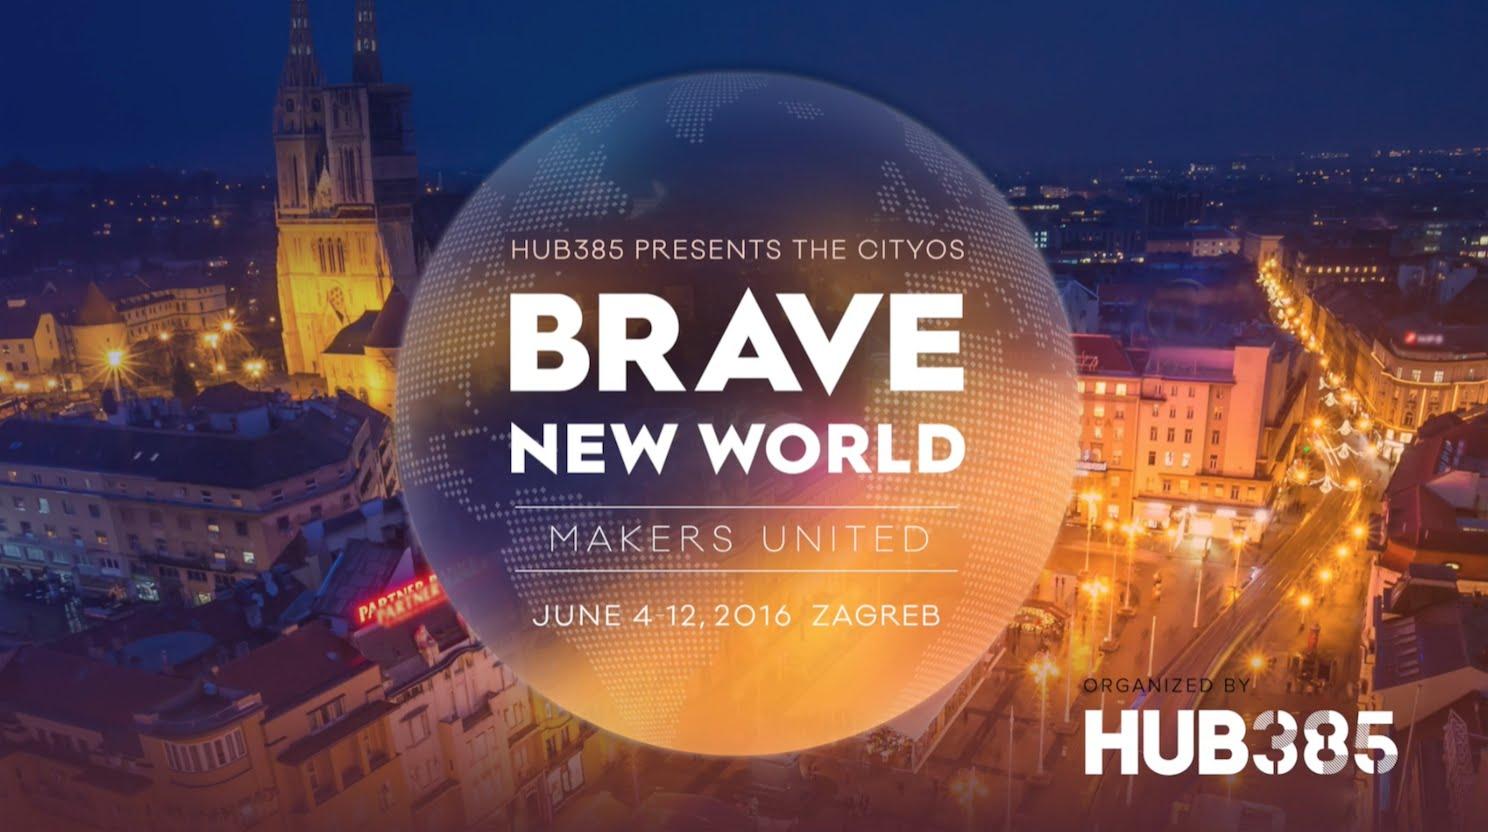 Zagreb Hosting One of Europe's Biggest New Technology Festivals